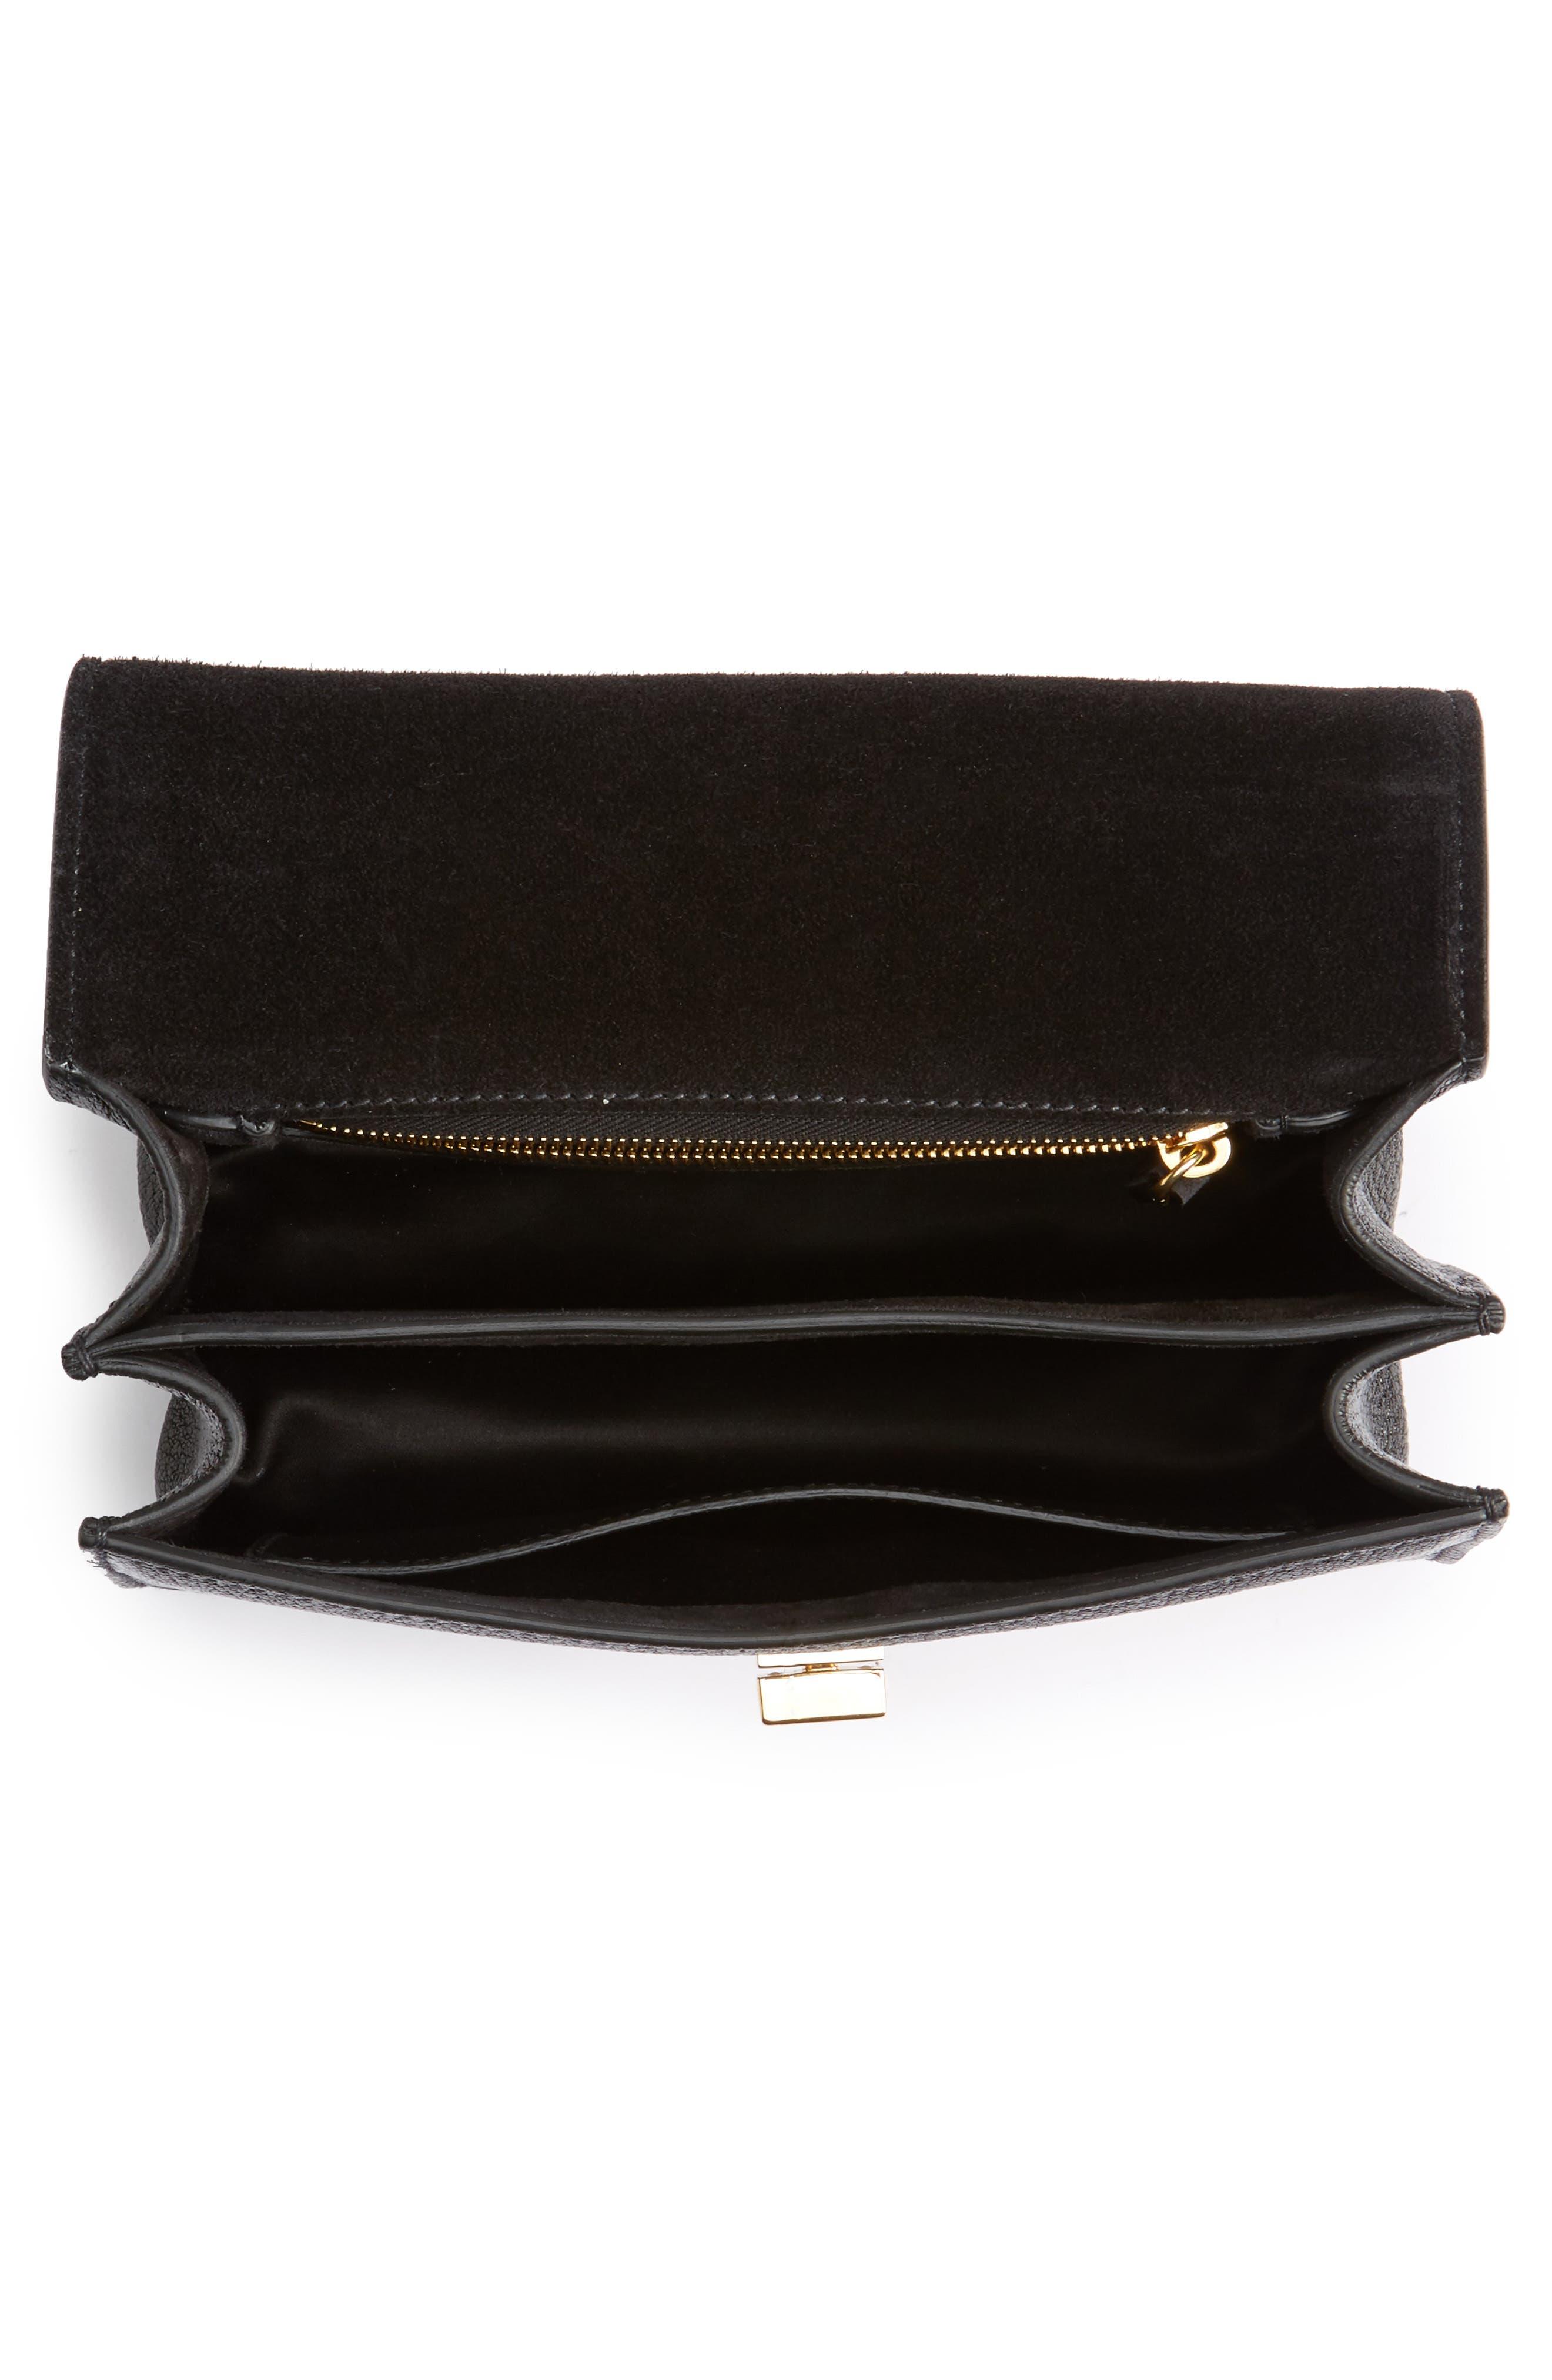 Madras Leather Crossbody Bag,                             Alternate thumbnail 4, color,                             001